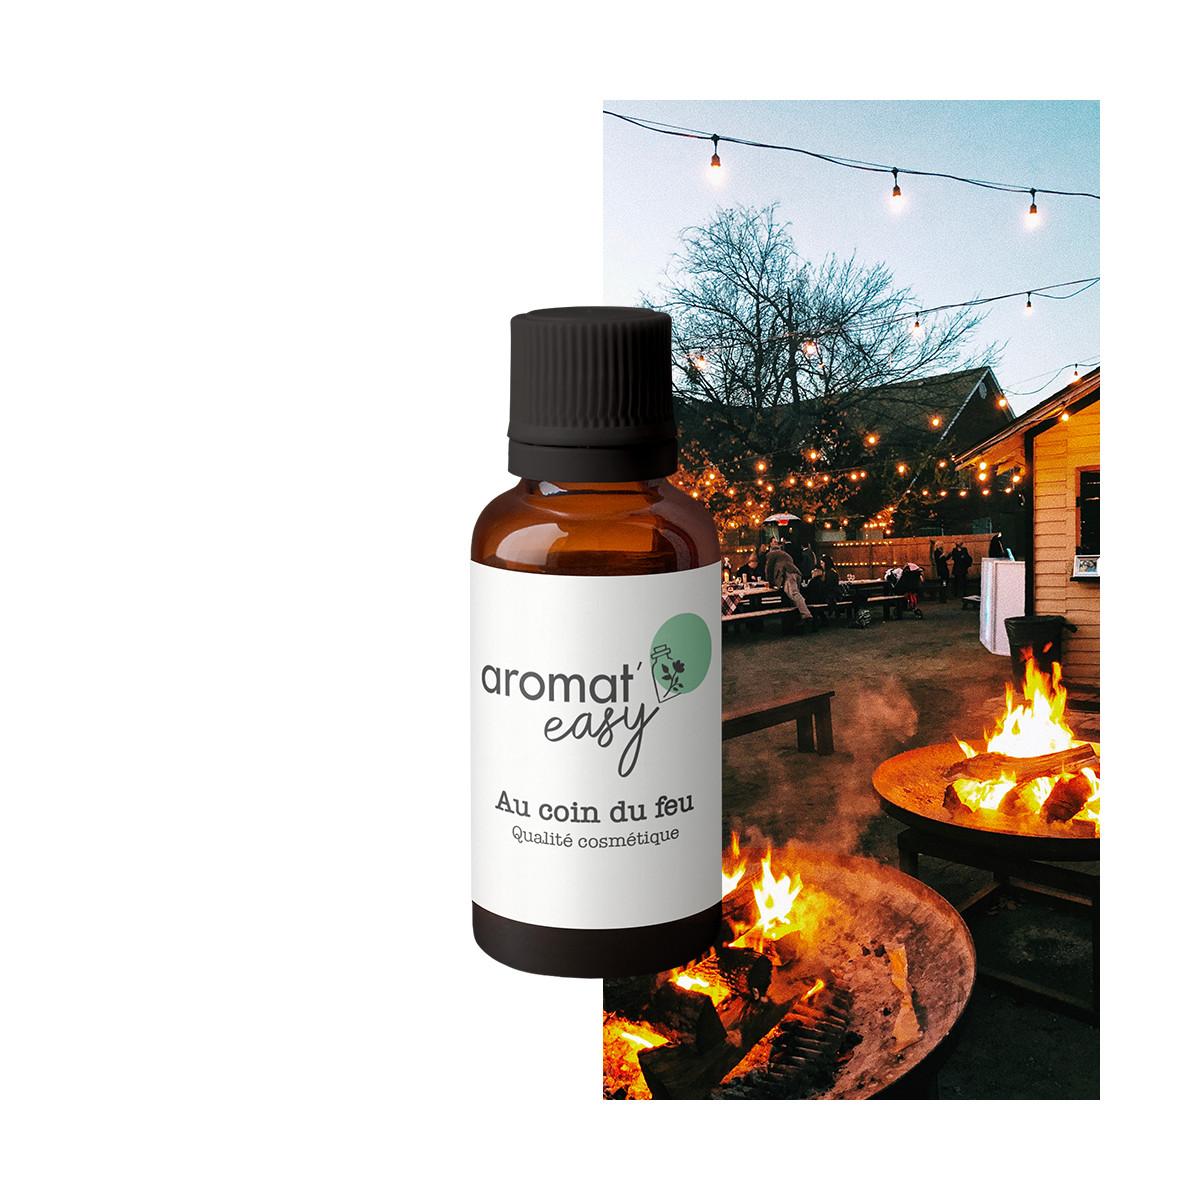 Fragrance Au coin du feu